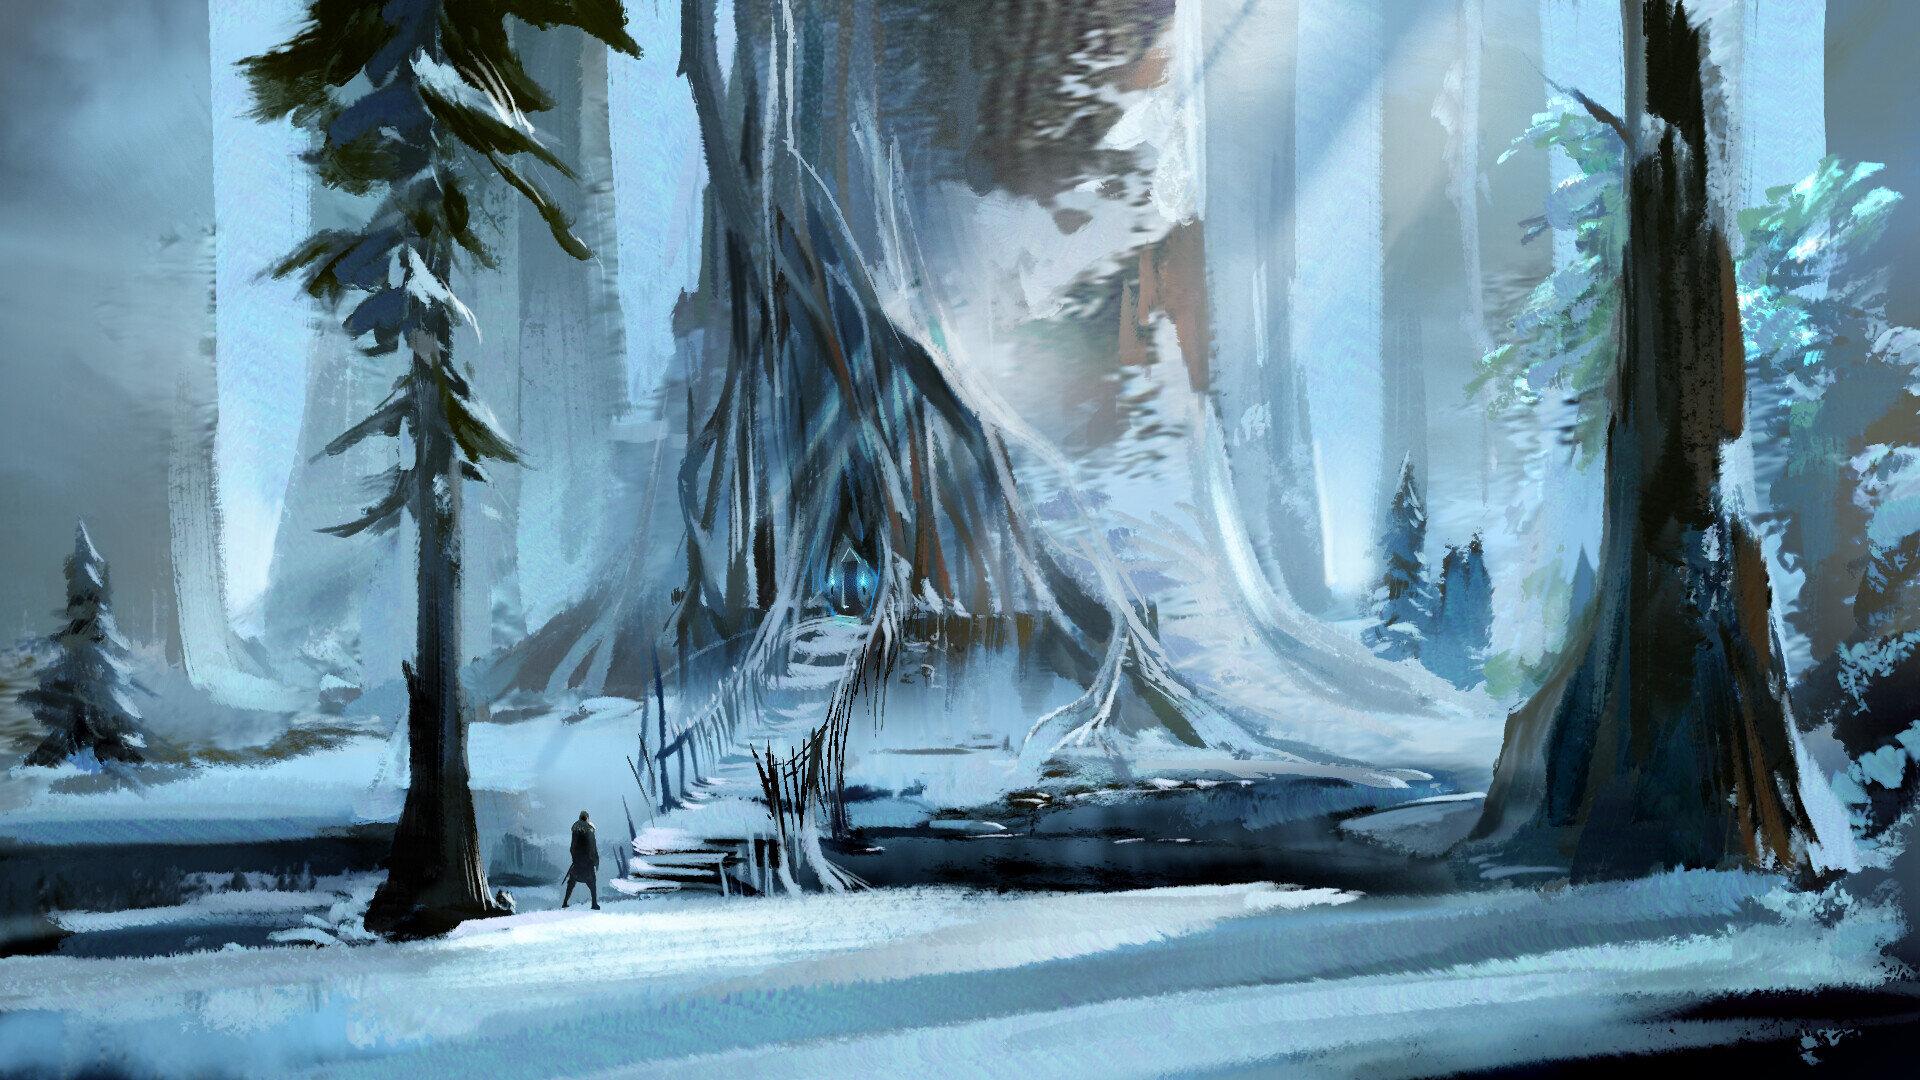 patrick-jensen-telltalegames-gameofthrones-patrickjensen-northgrovesketch.jpg